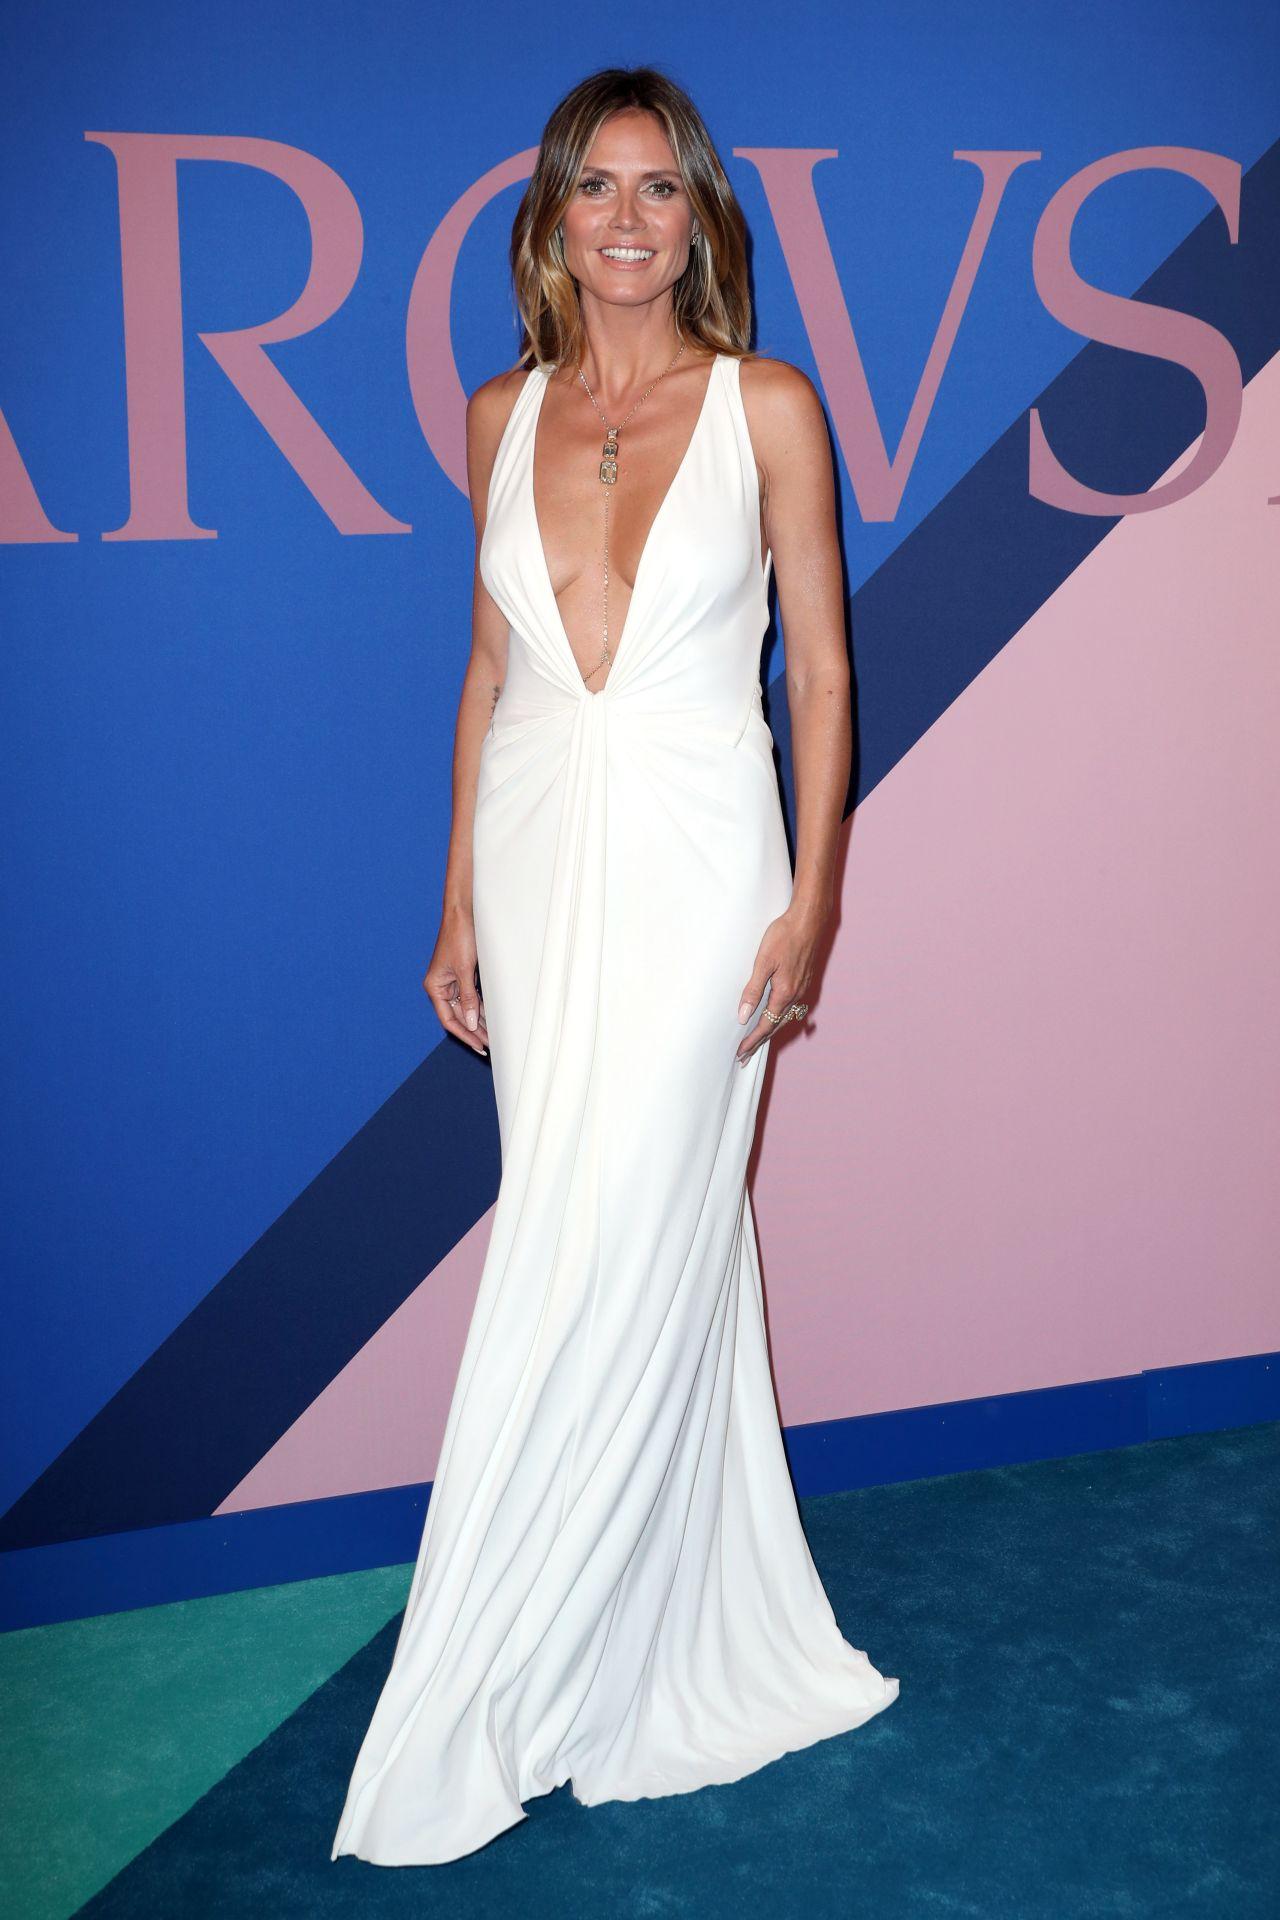 Heidi Klum On Red Carpet Cfda Fashion Awards In New York